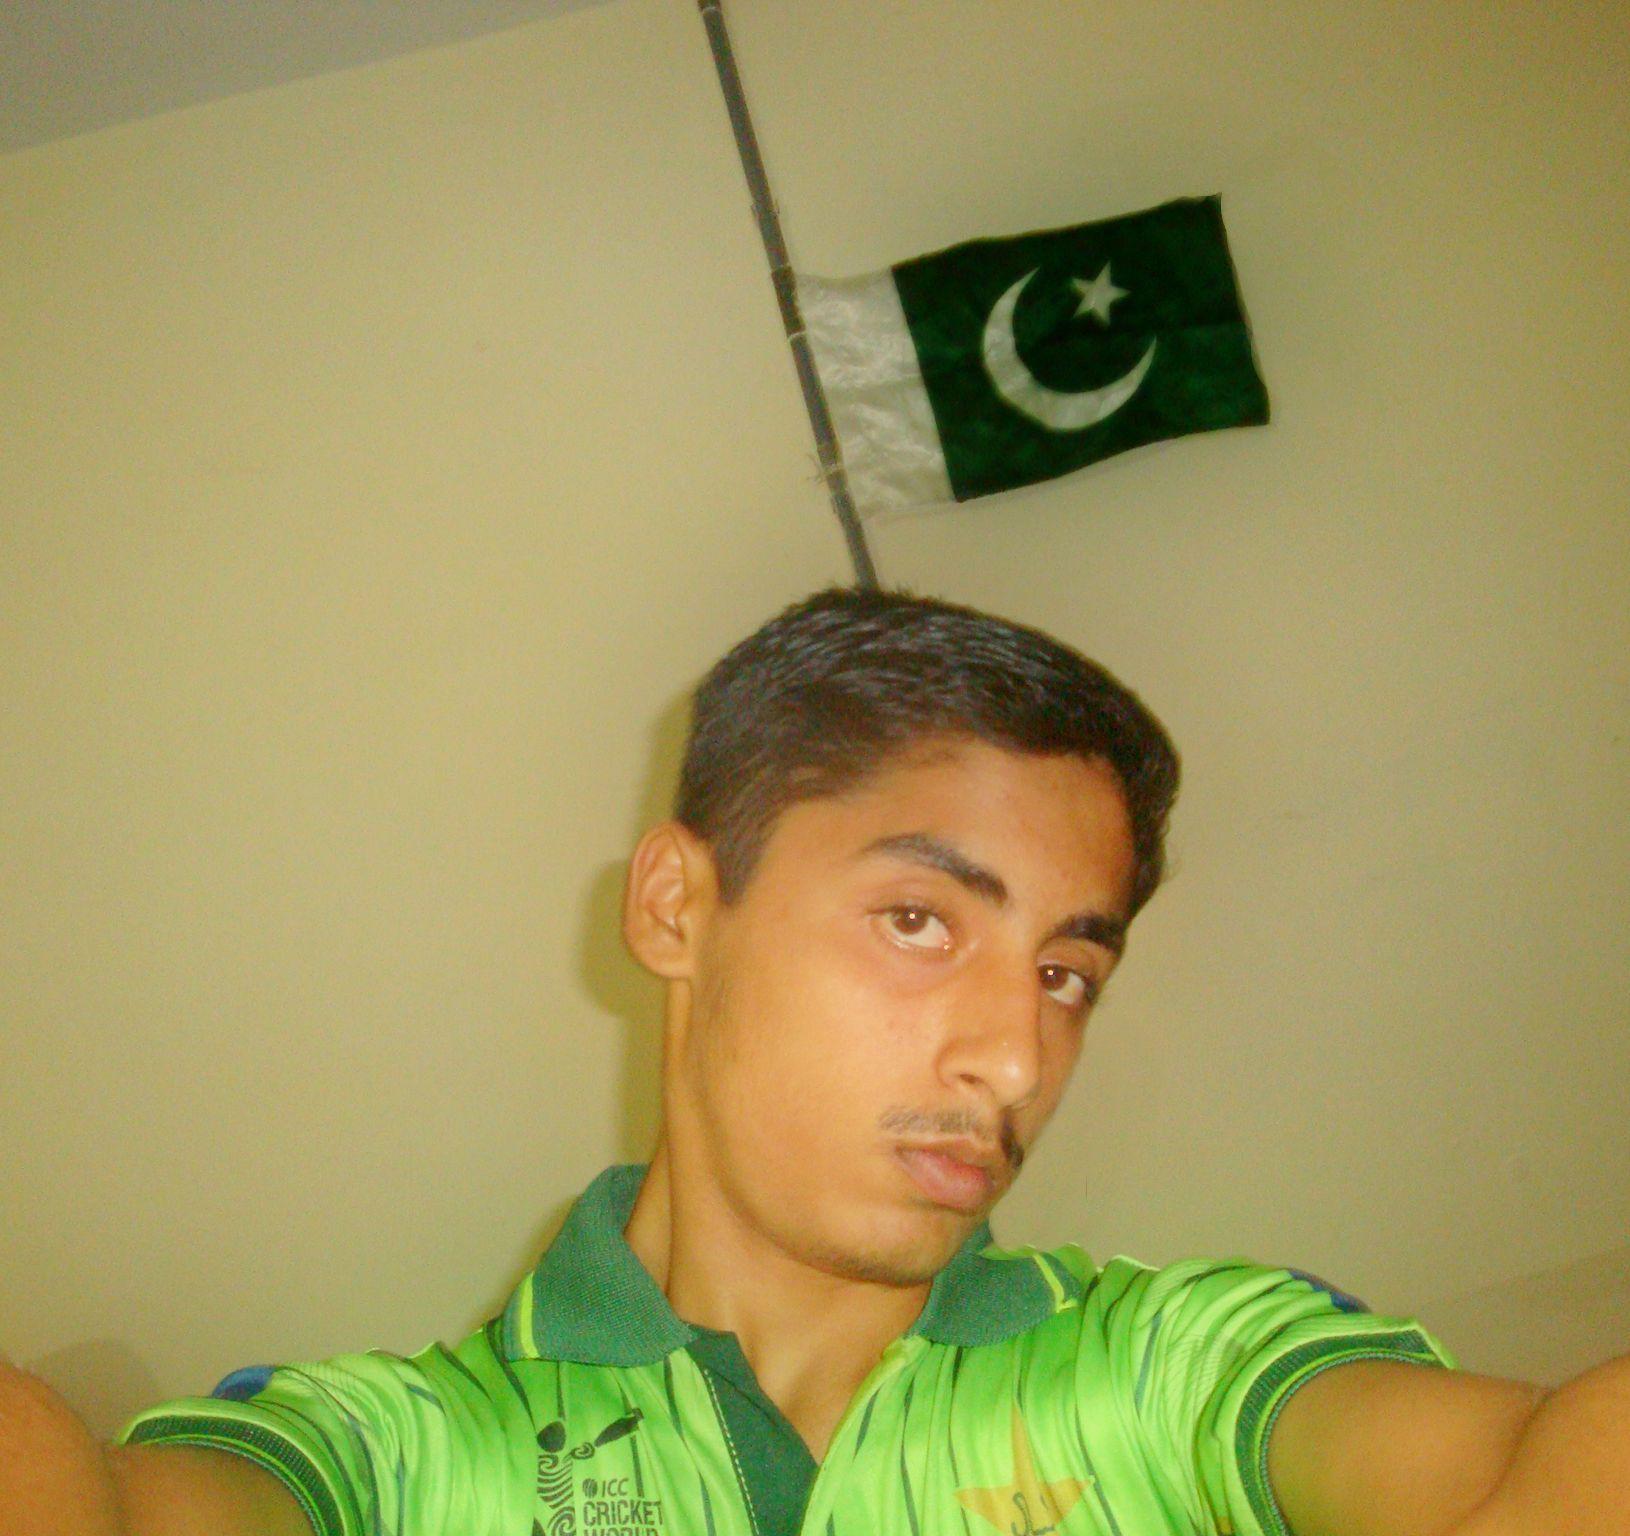 #Selfie with #PAK_FLAG........... PRoud PAK